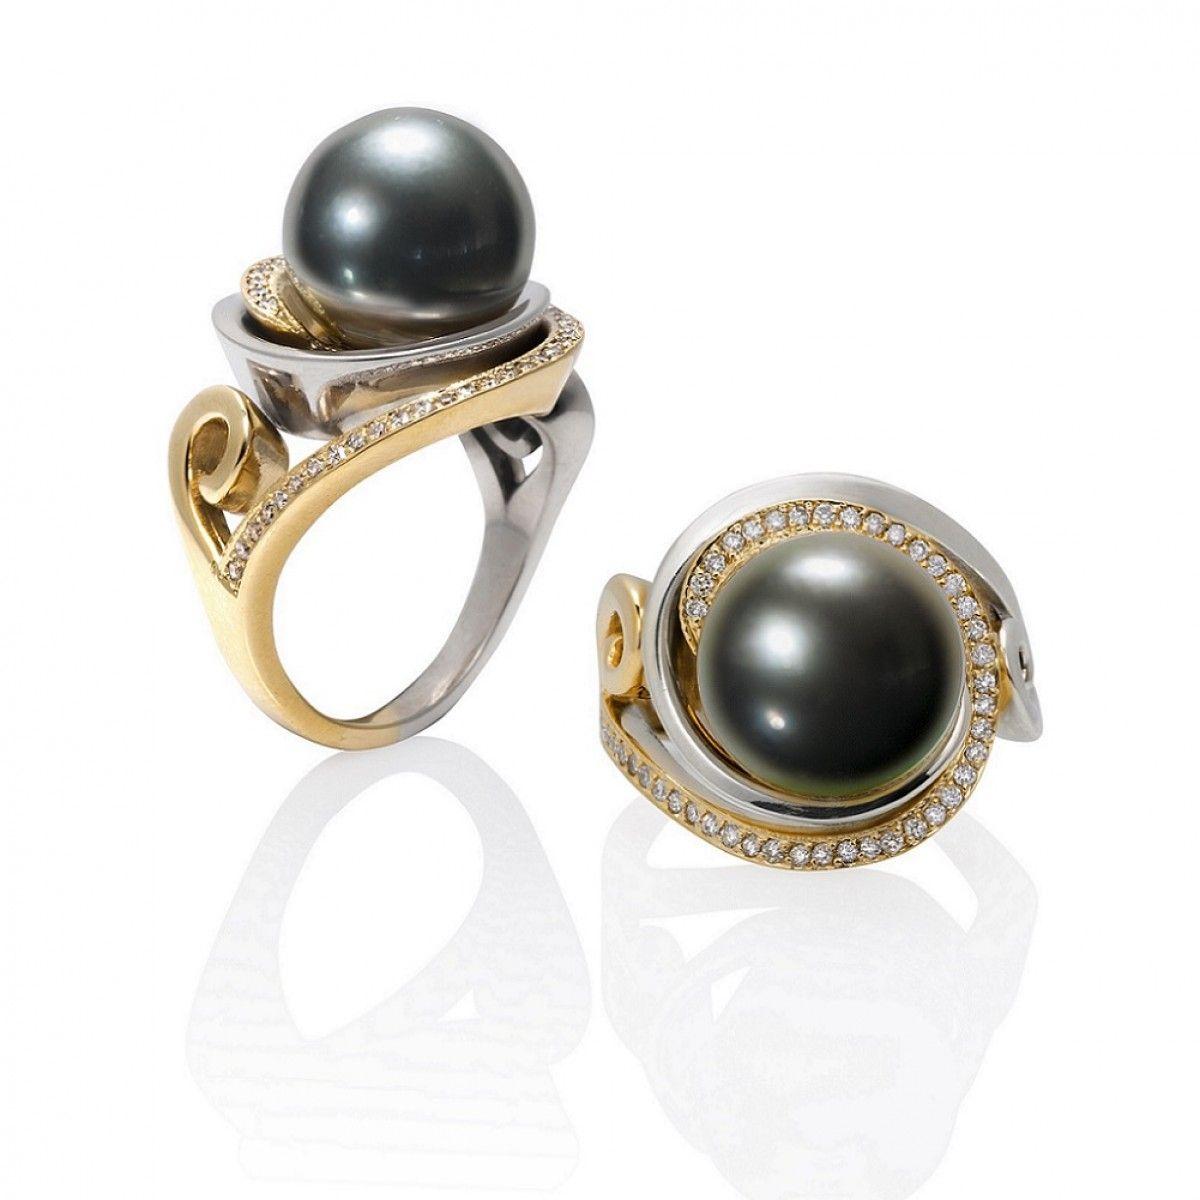 NEBULA 2-Tone Pearl Ring with Diamonds